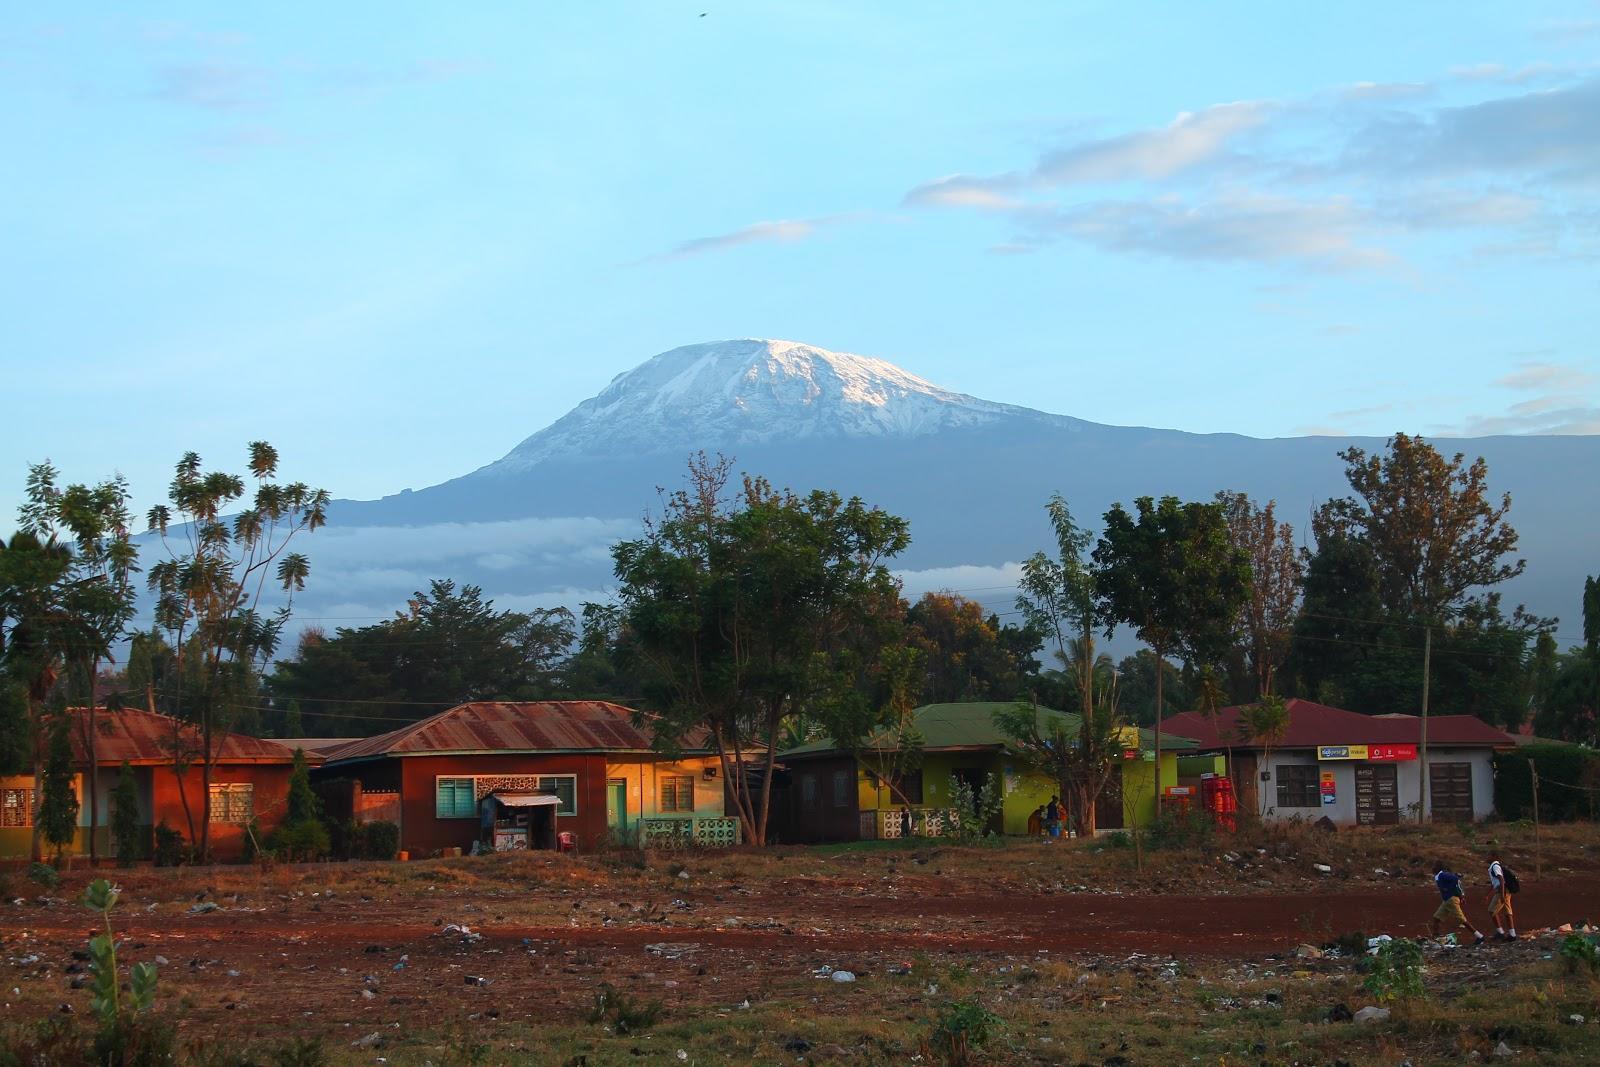 Ranné Kilimanjaro, Moshi